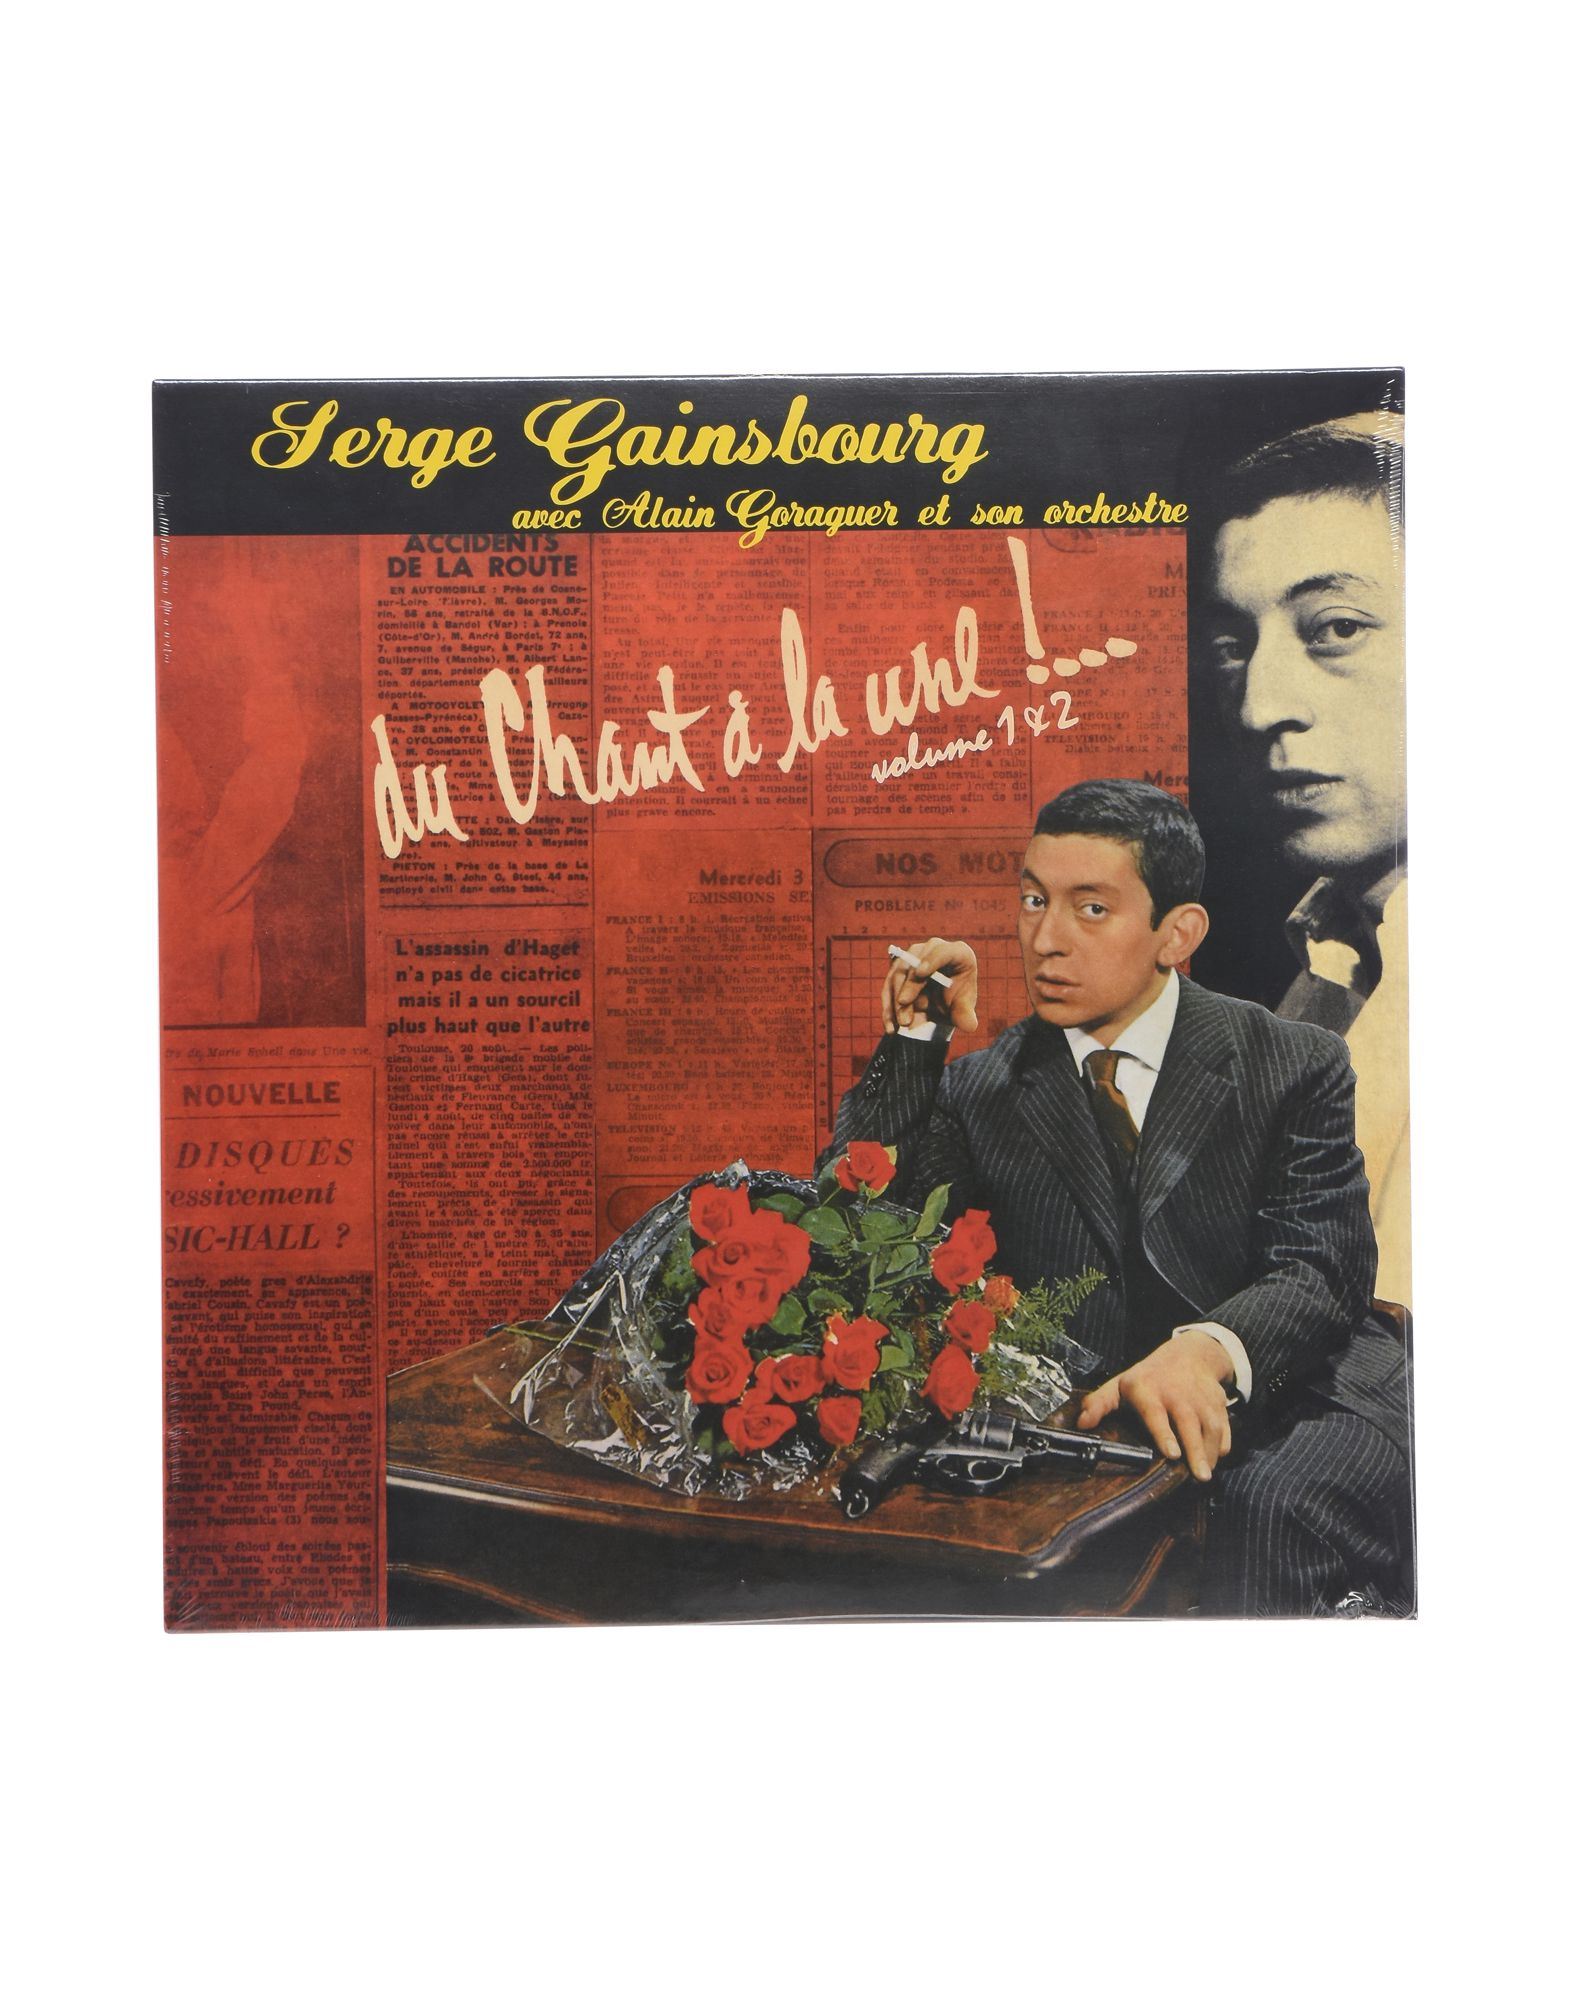 MUSIC ON VINYL Колонка аудио сайдинг vinyl on j профиль 3660 мм кремовый